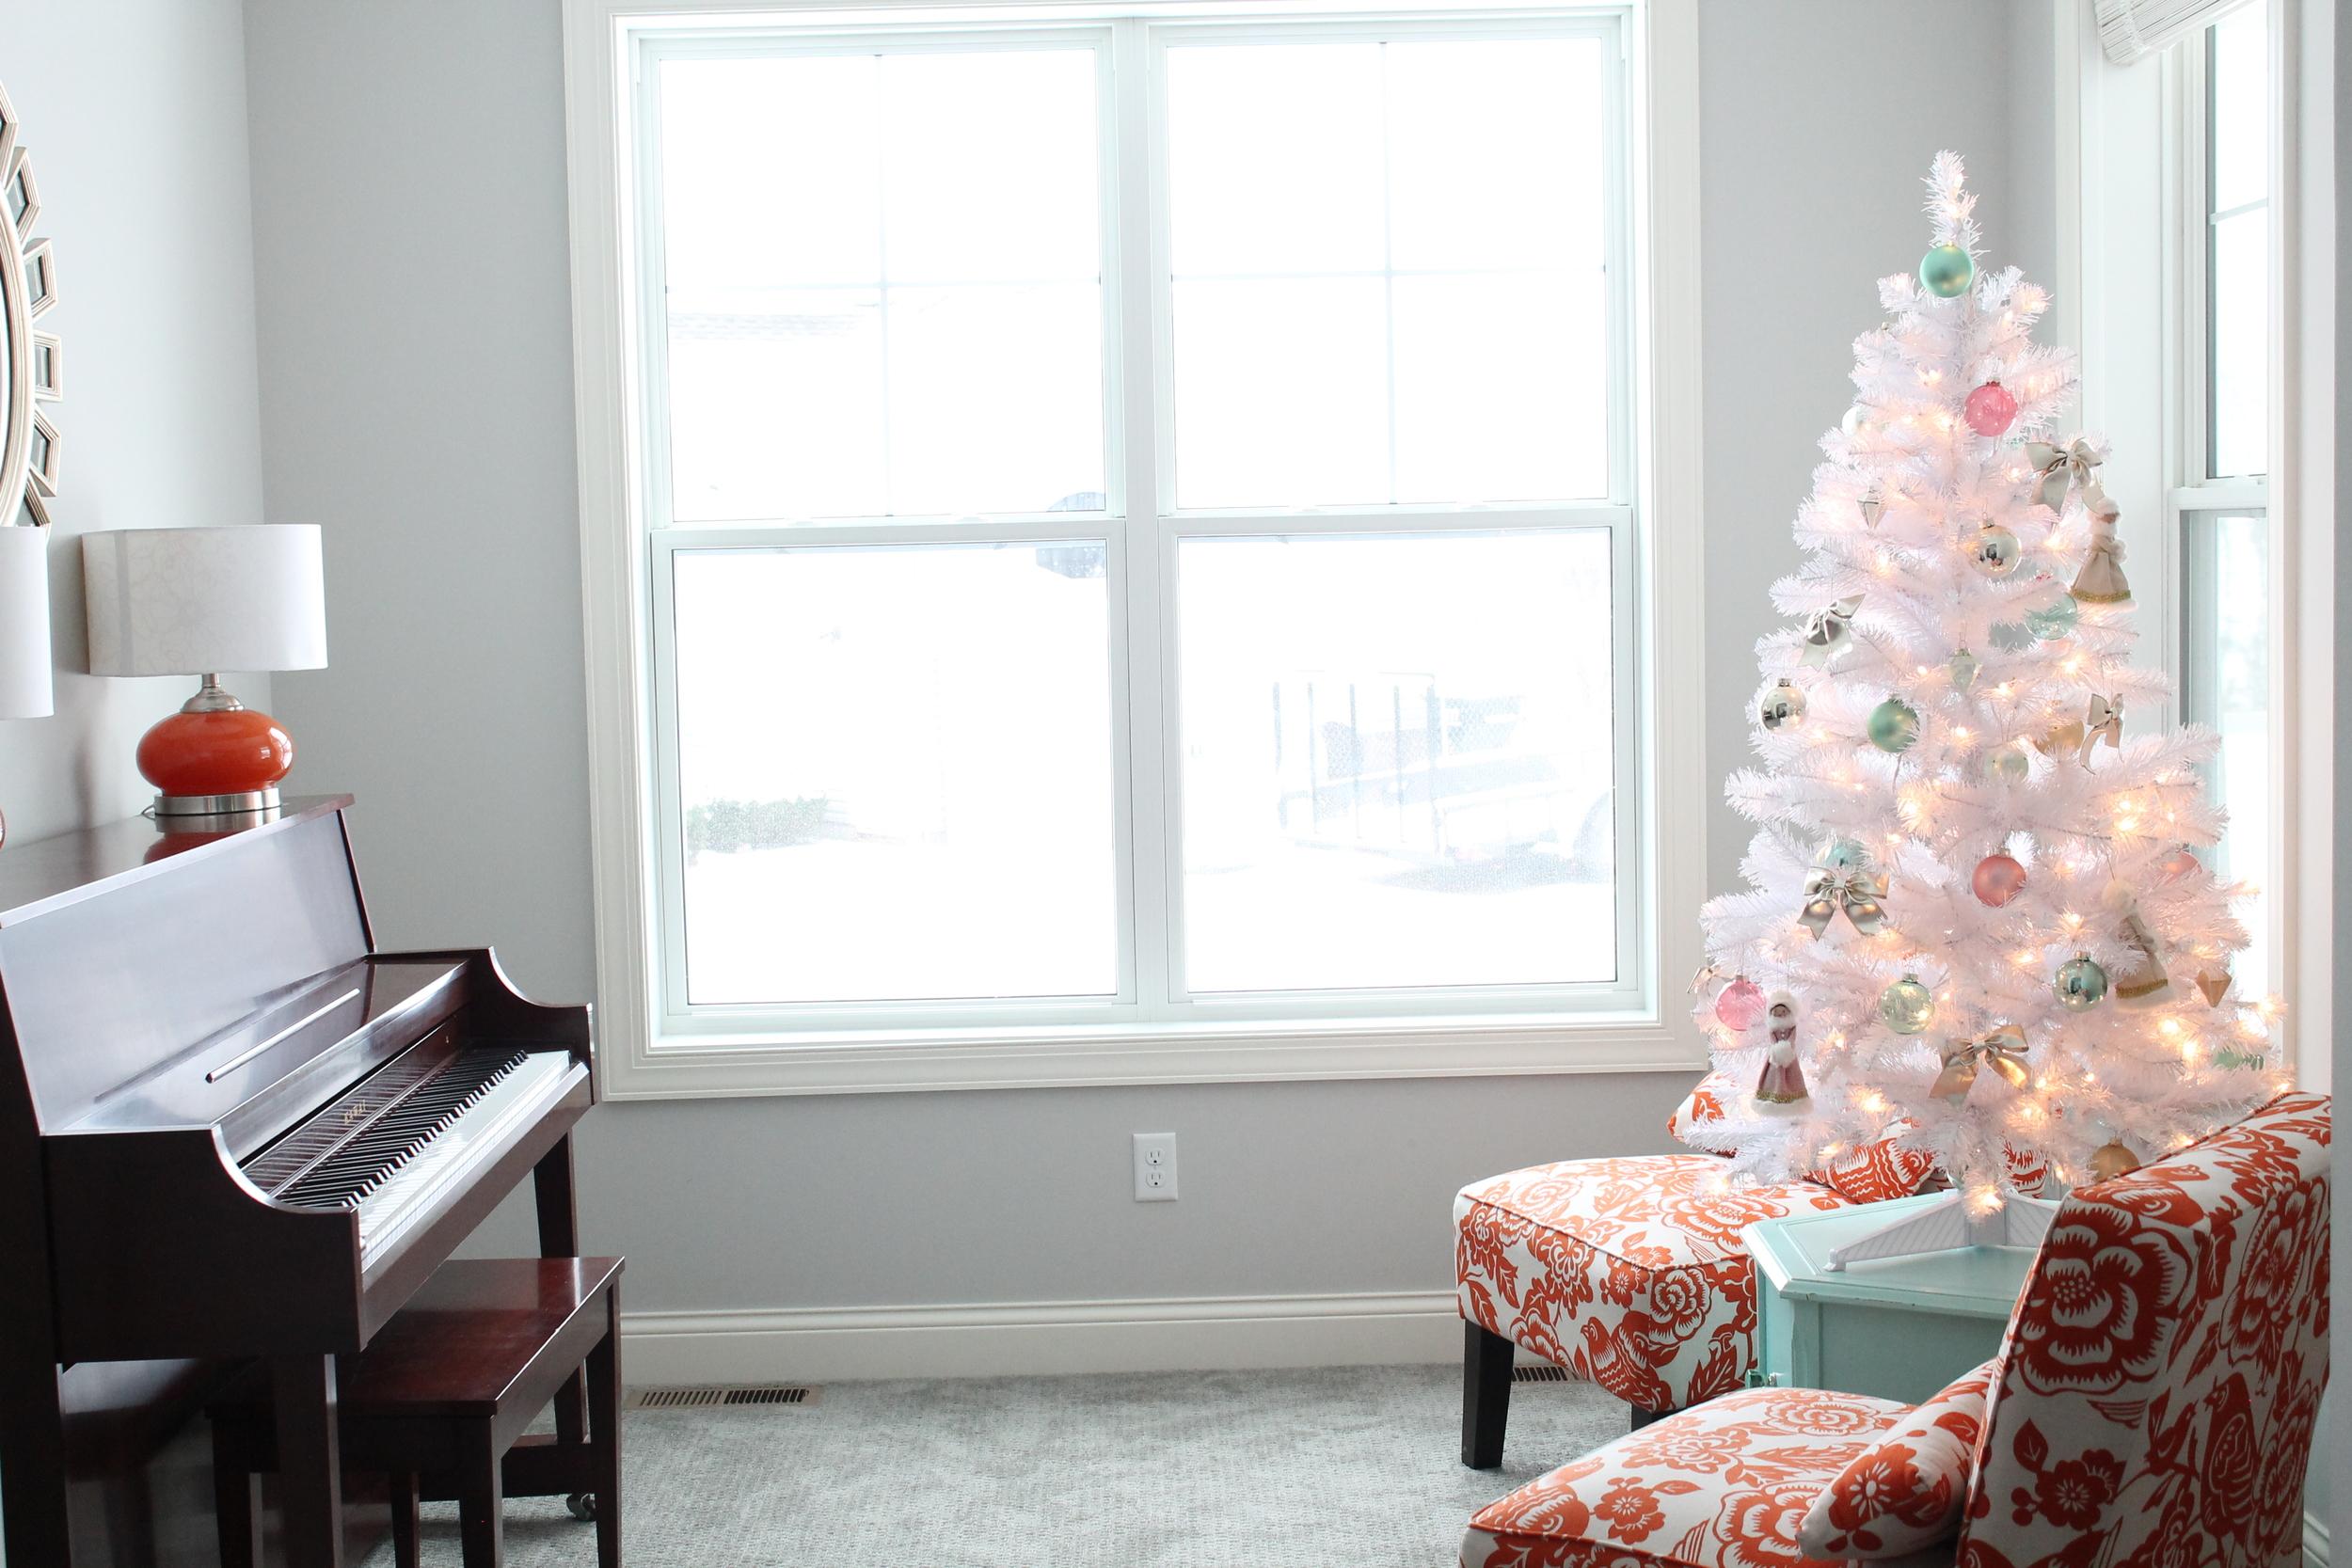 Christmas Piano Room With White Christmas Tree